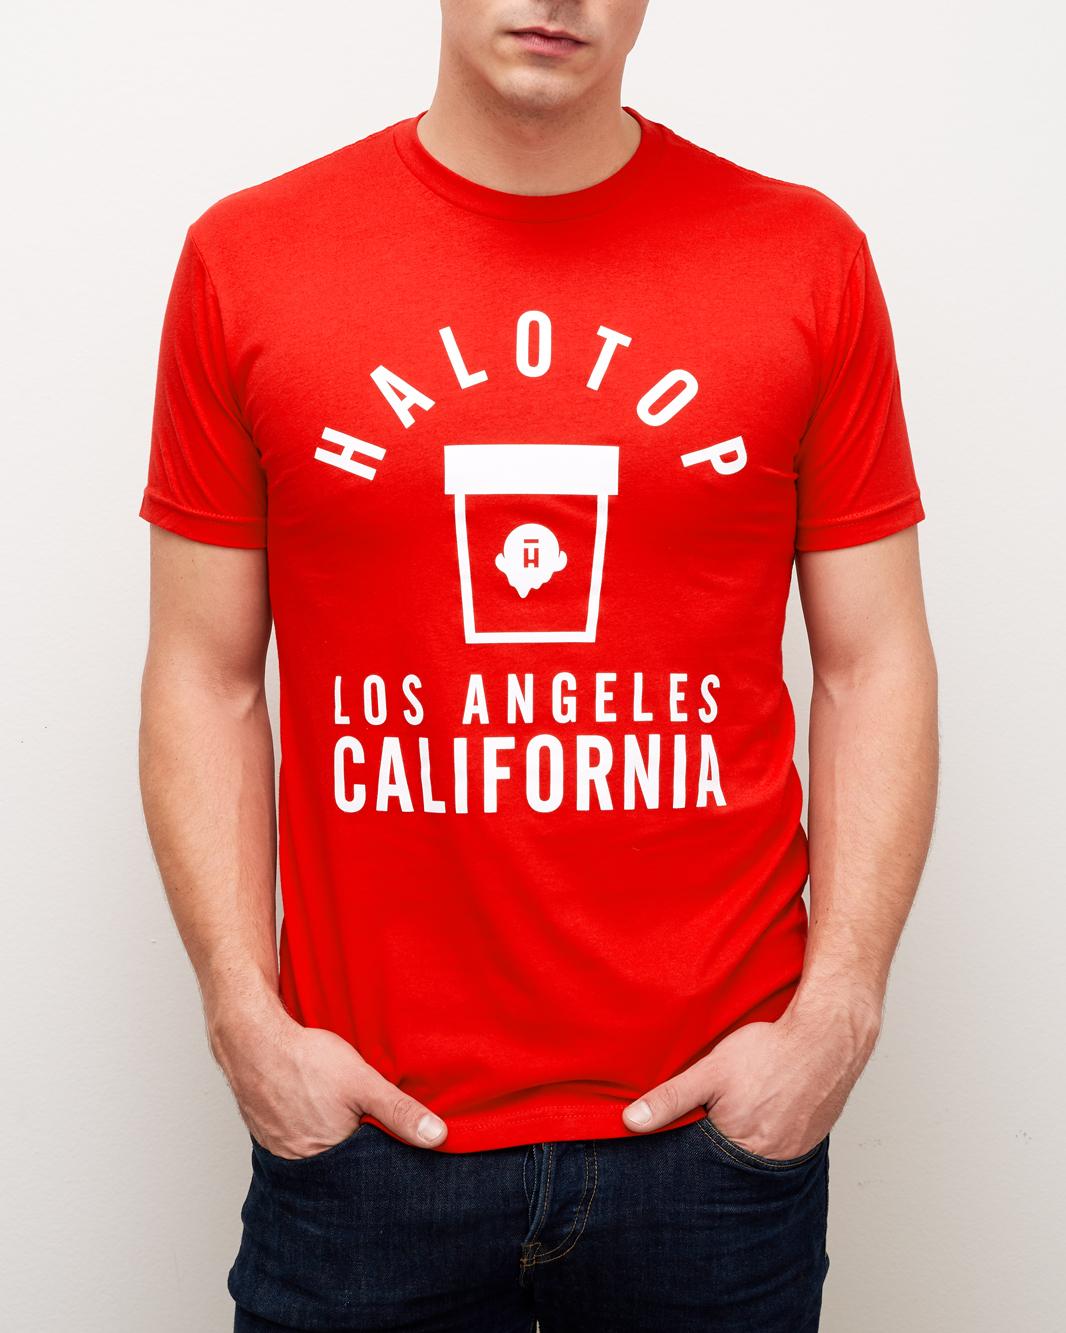 HaloTop-RedShirt-1-web.jpg